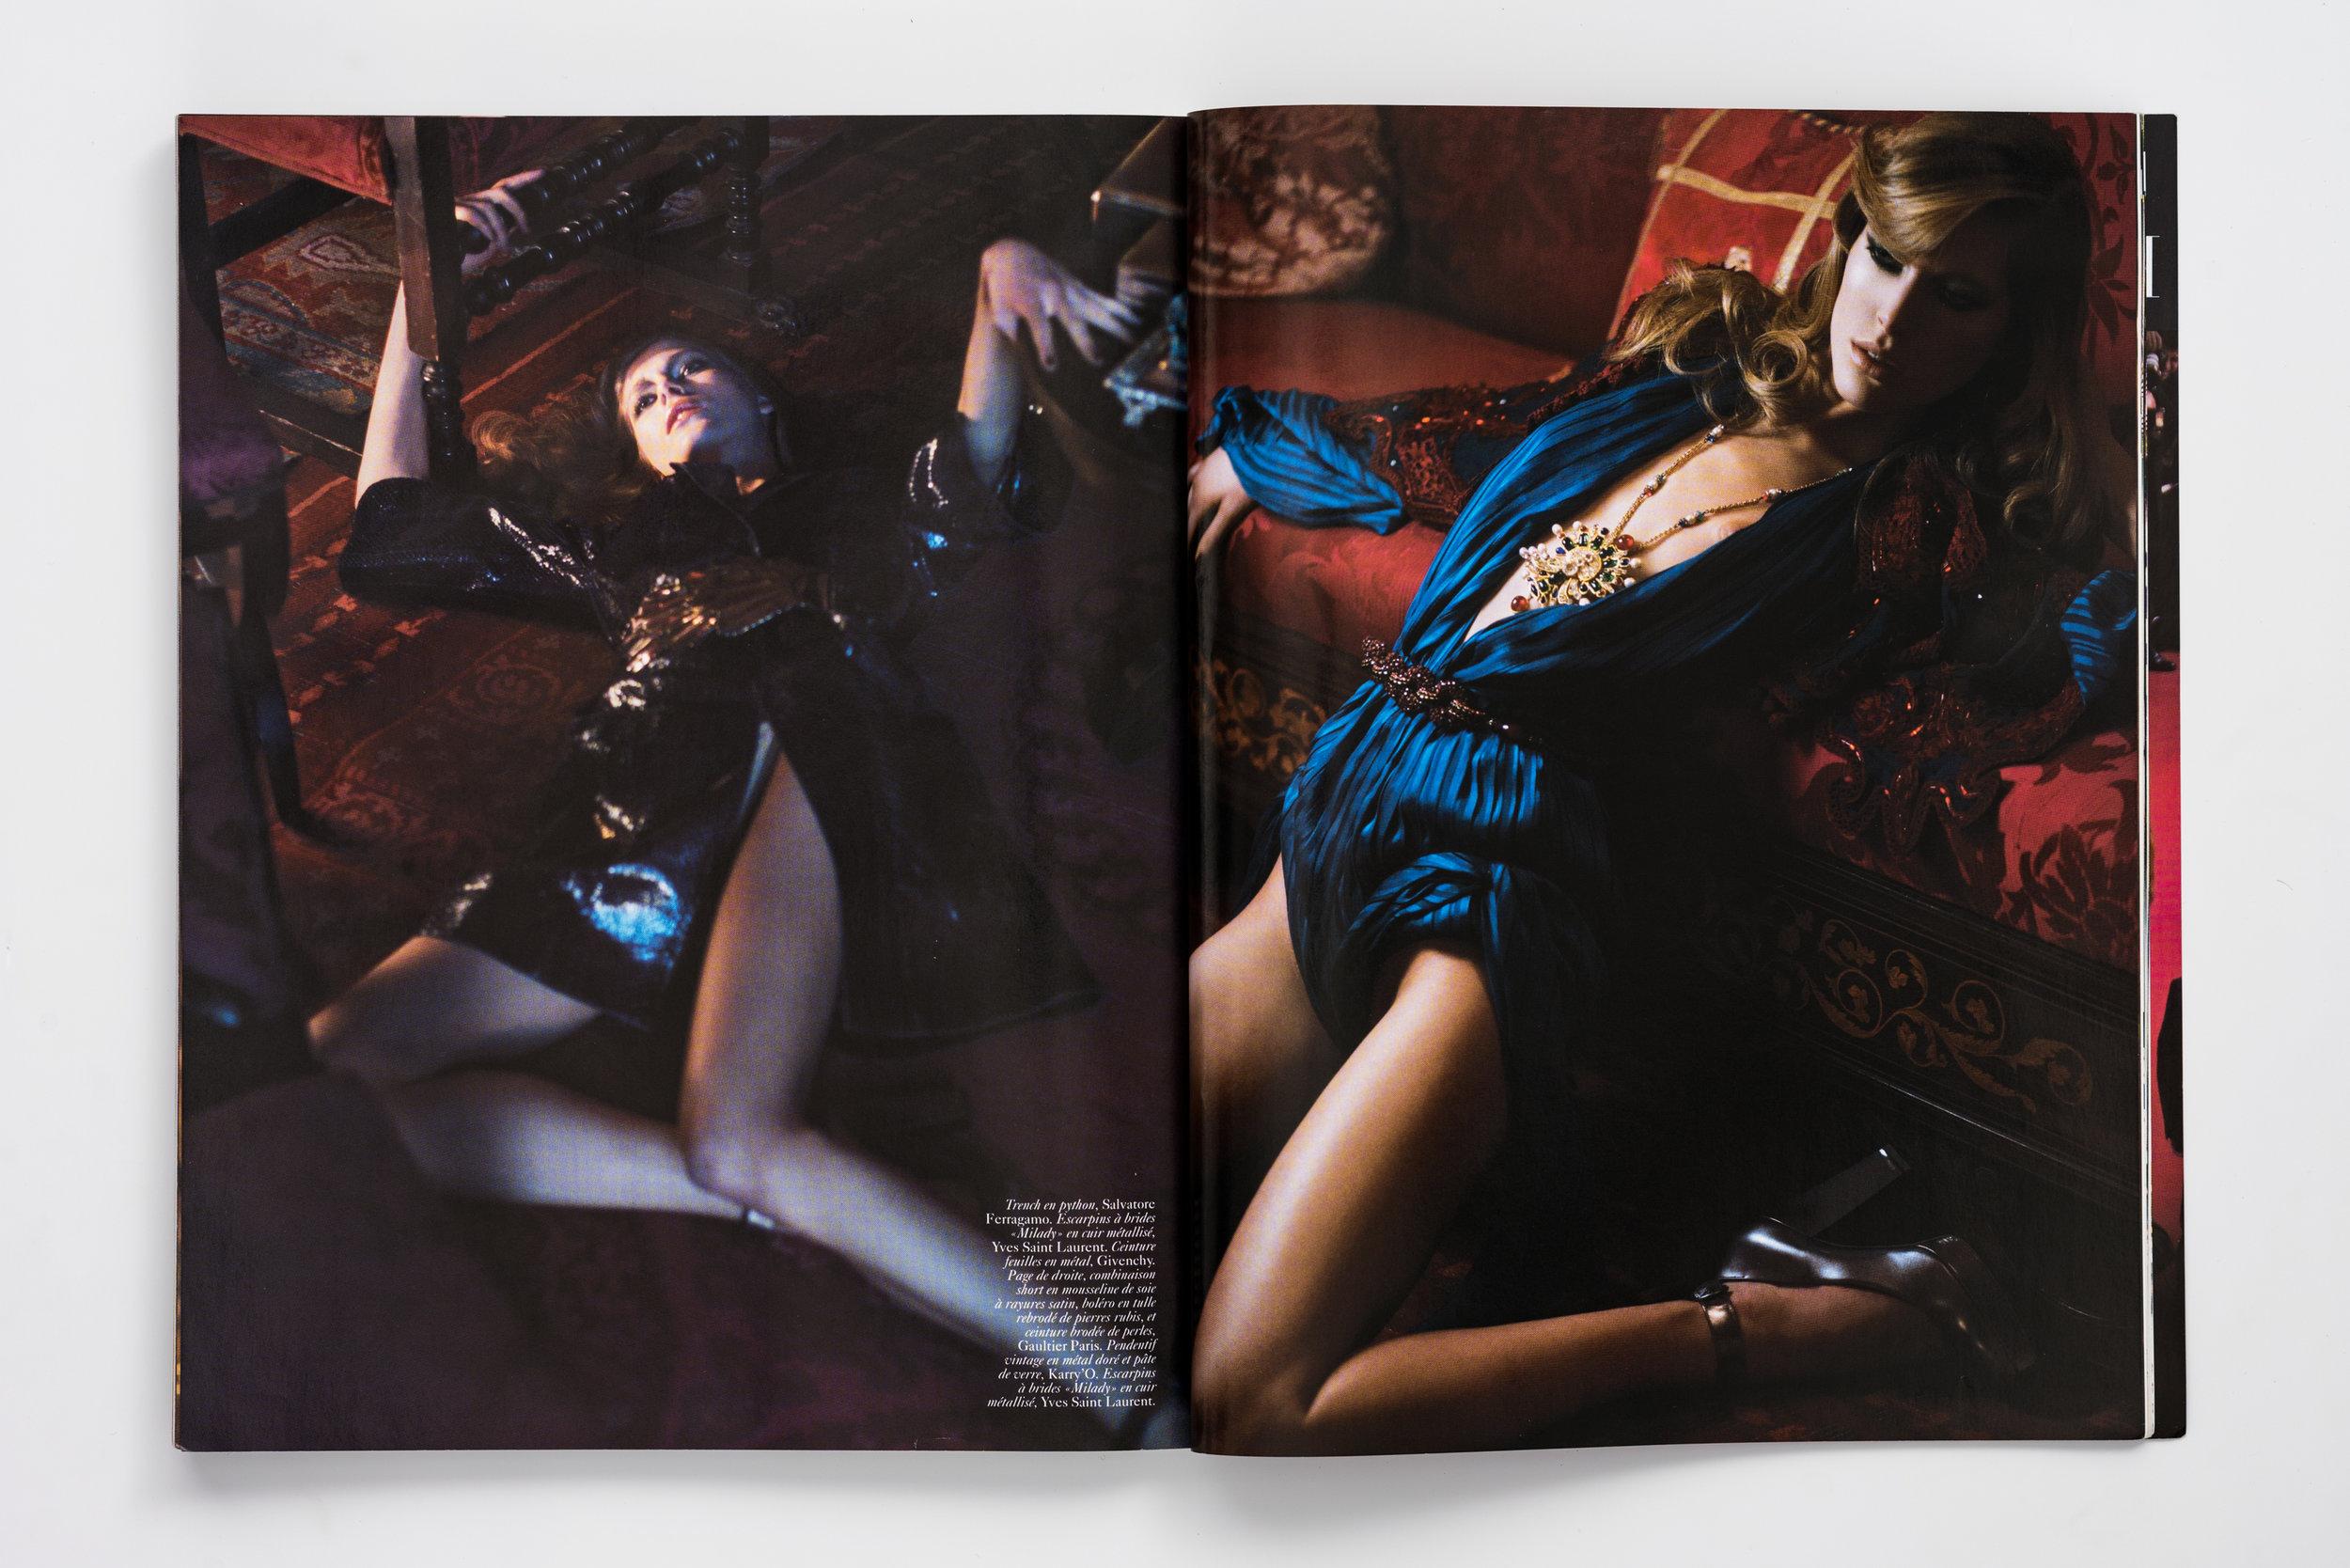 Iselin Steiro_Mario Sorrenti_Vogue Paris_Nuit Fauve_5.jpg